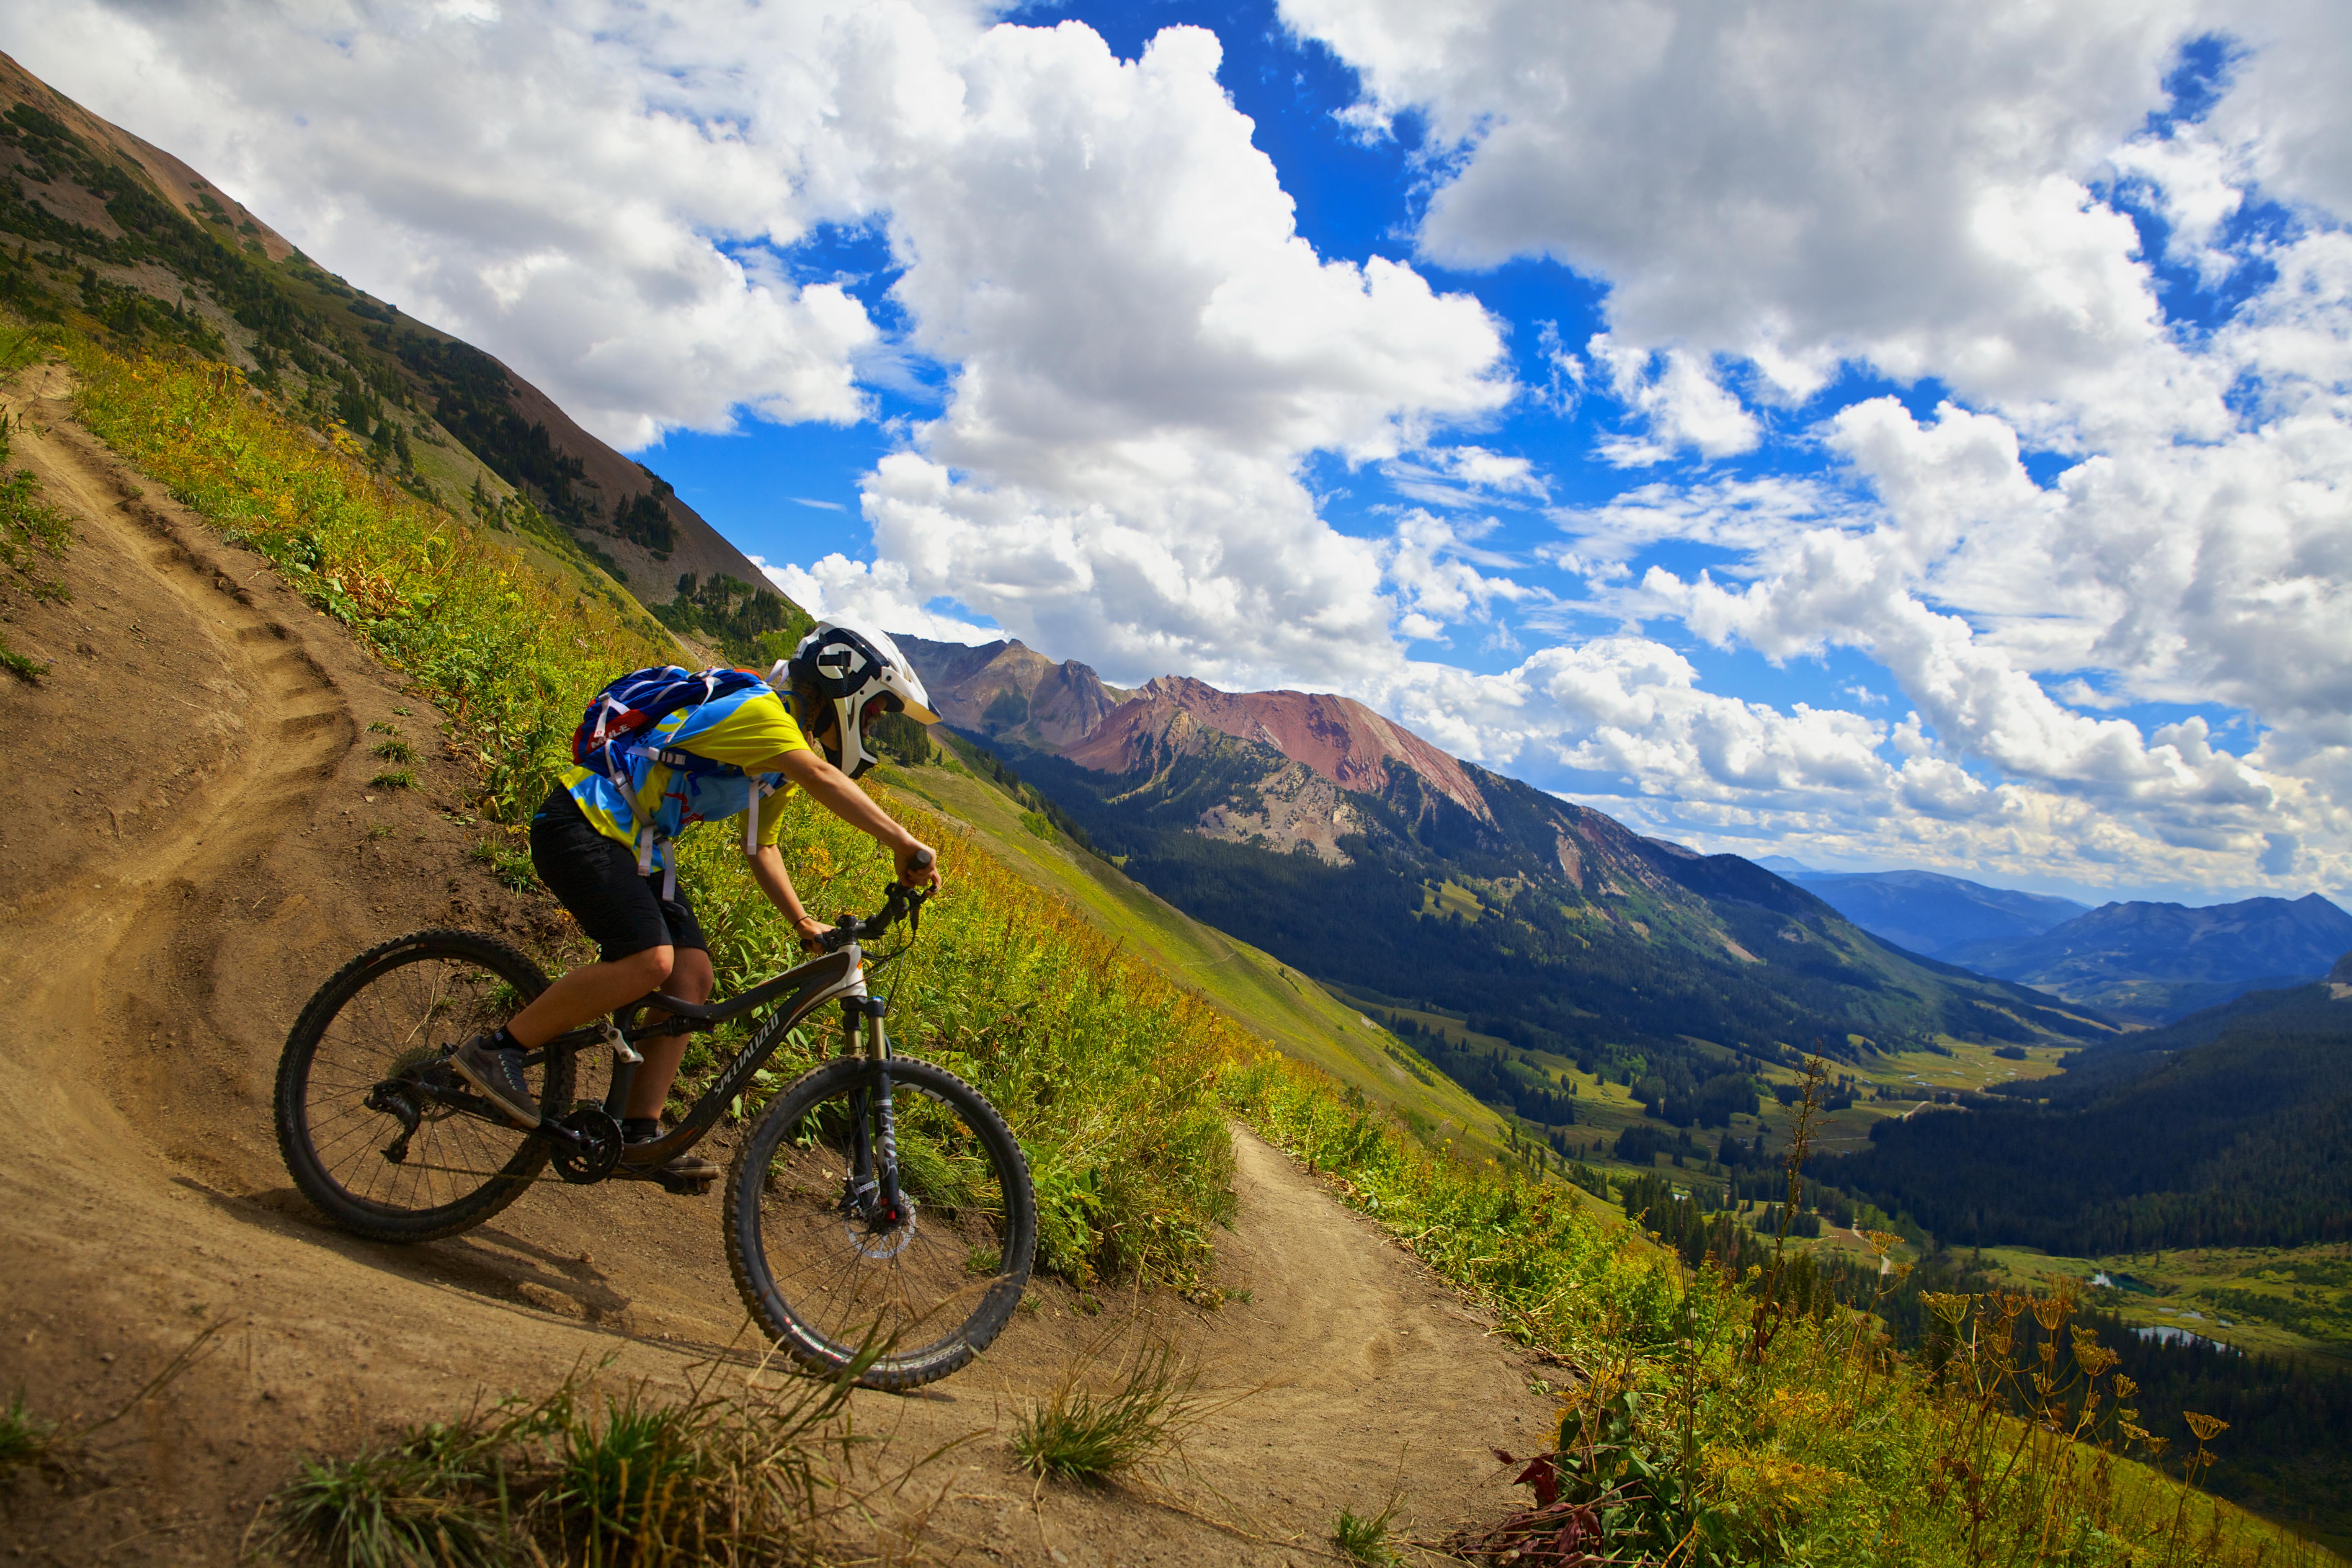 Crested_Butte_Biking_(9941640553)